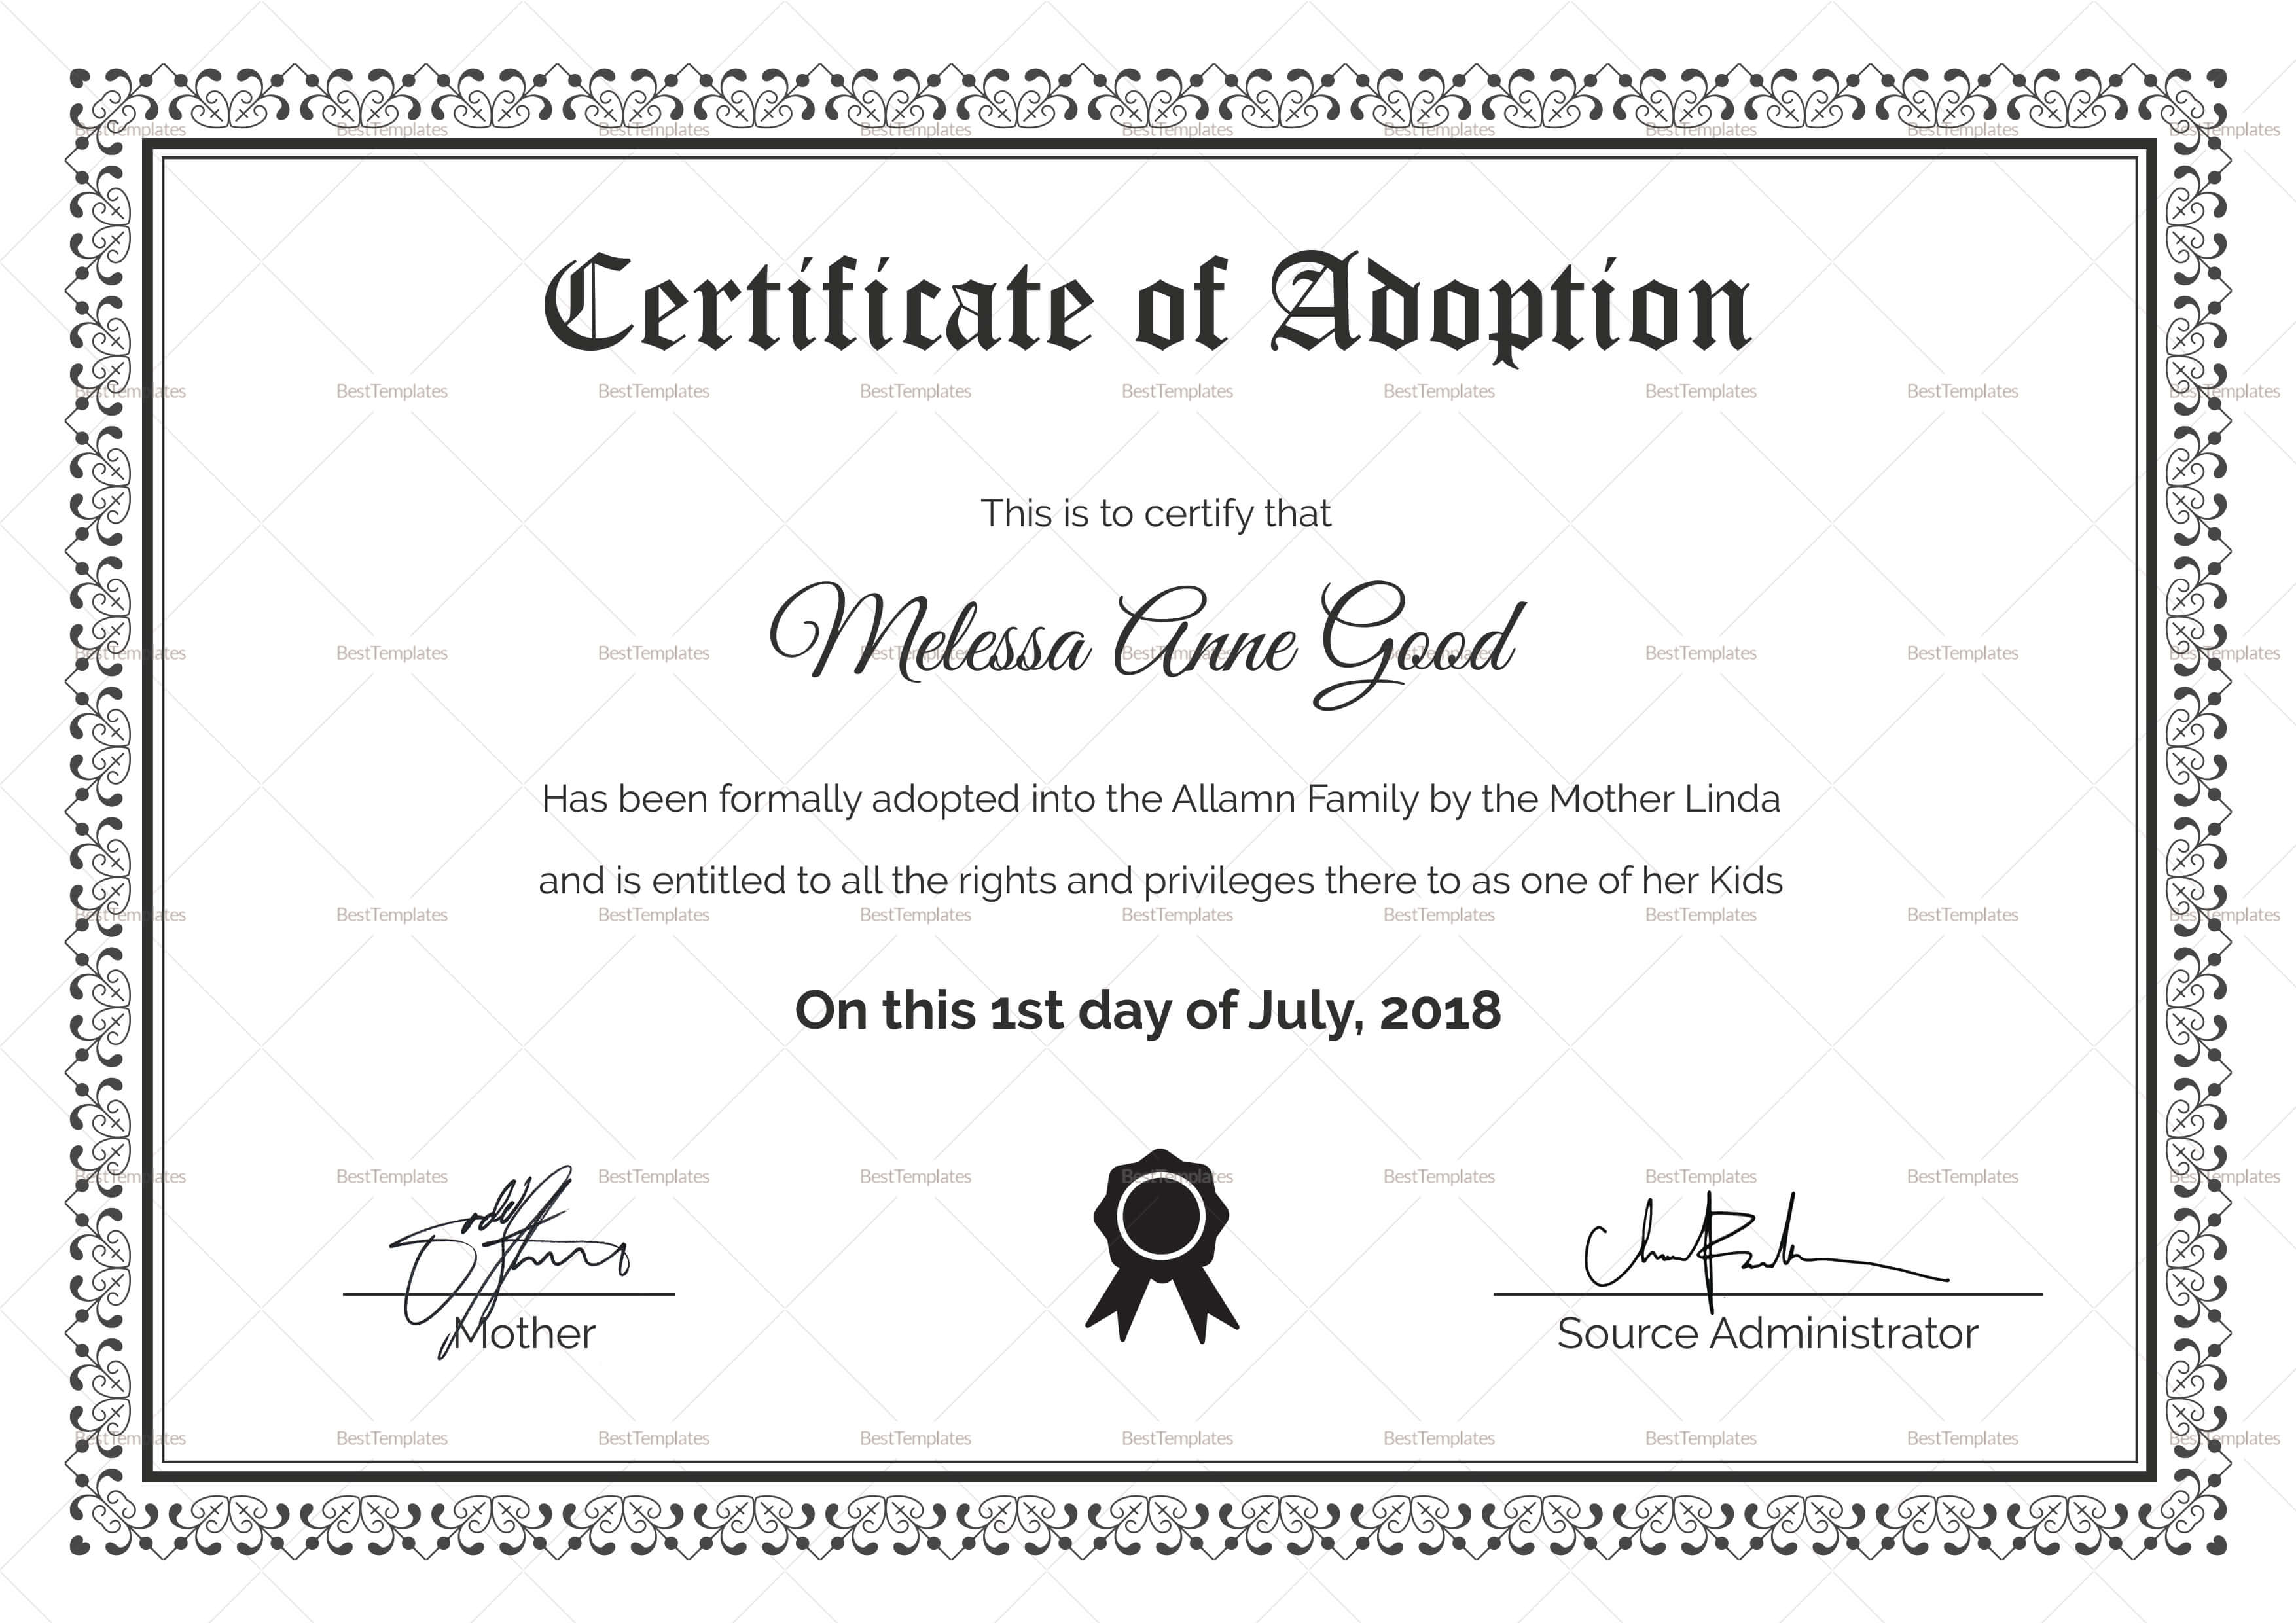 Adoption Certificate Design Template Pertaining To Adoption Certificate Template